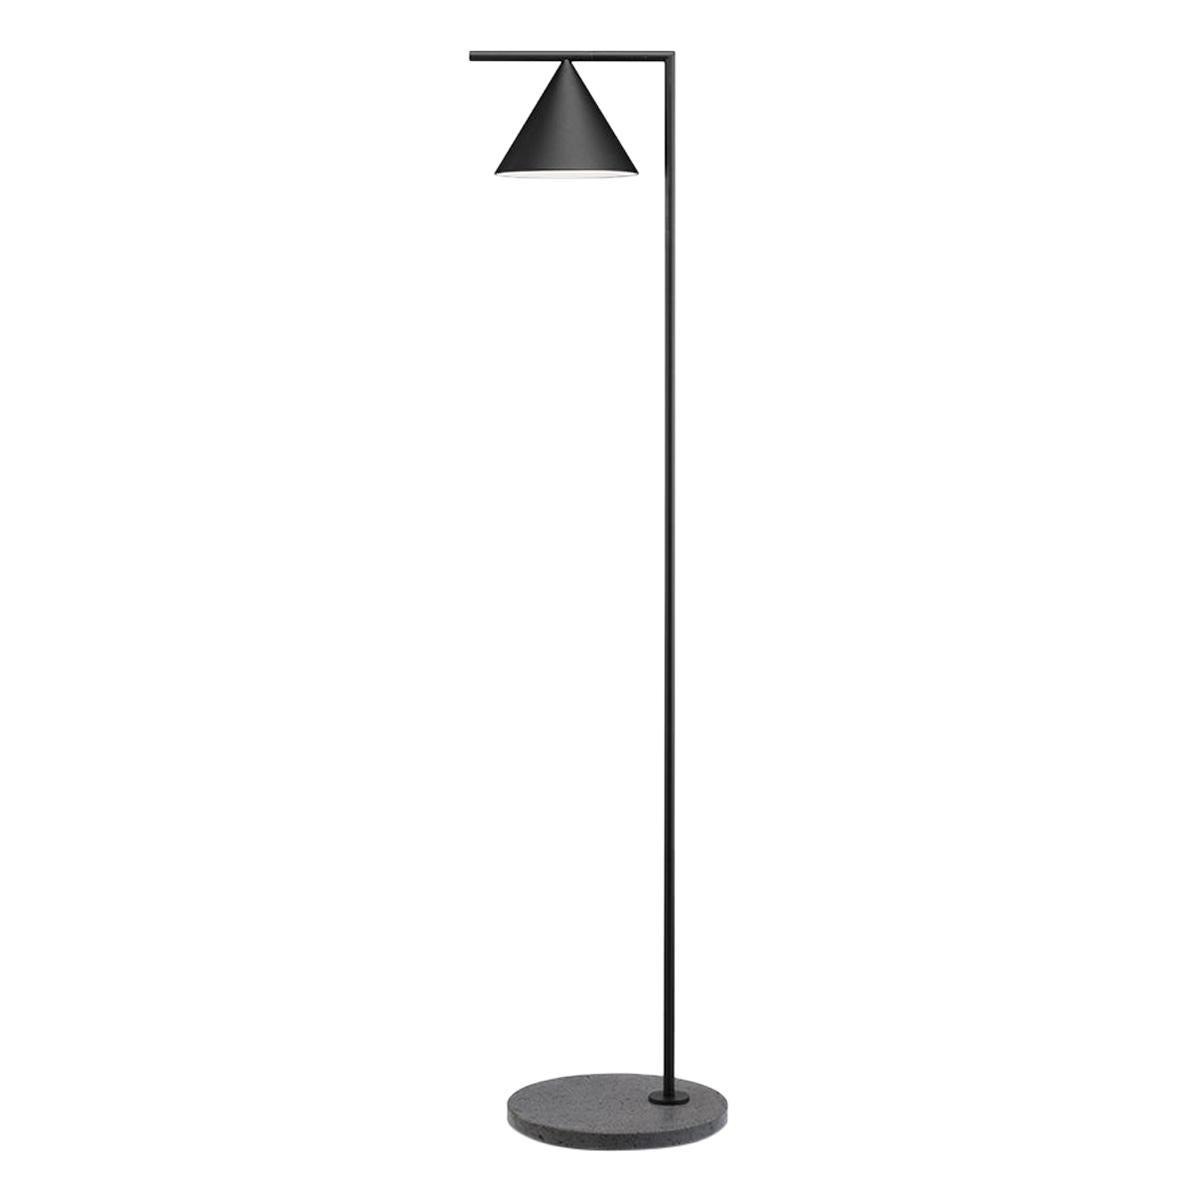 Flos Captain Flint 2700K Outdoor Floor Lamp by Michael Anastassiades